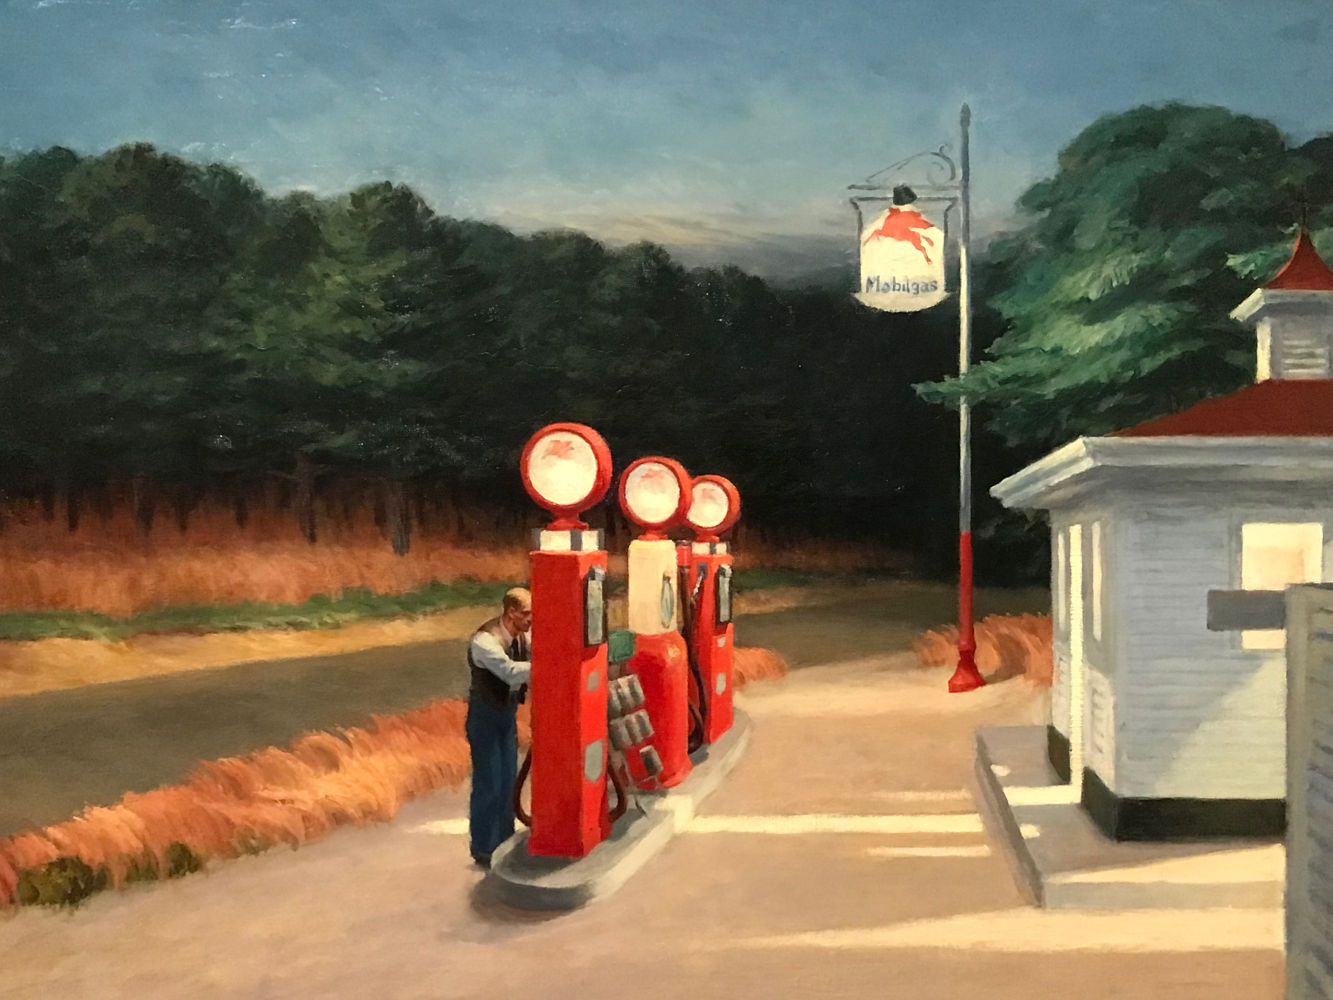 Gas (1940), Μητροπολιτικό Μουσείο της Νέας Υόρκης